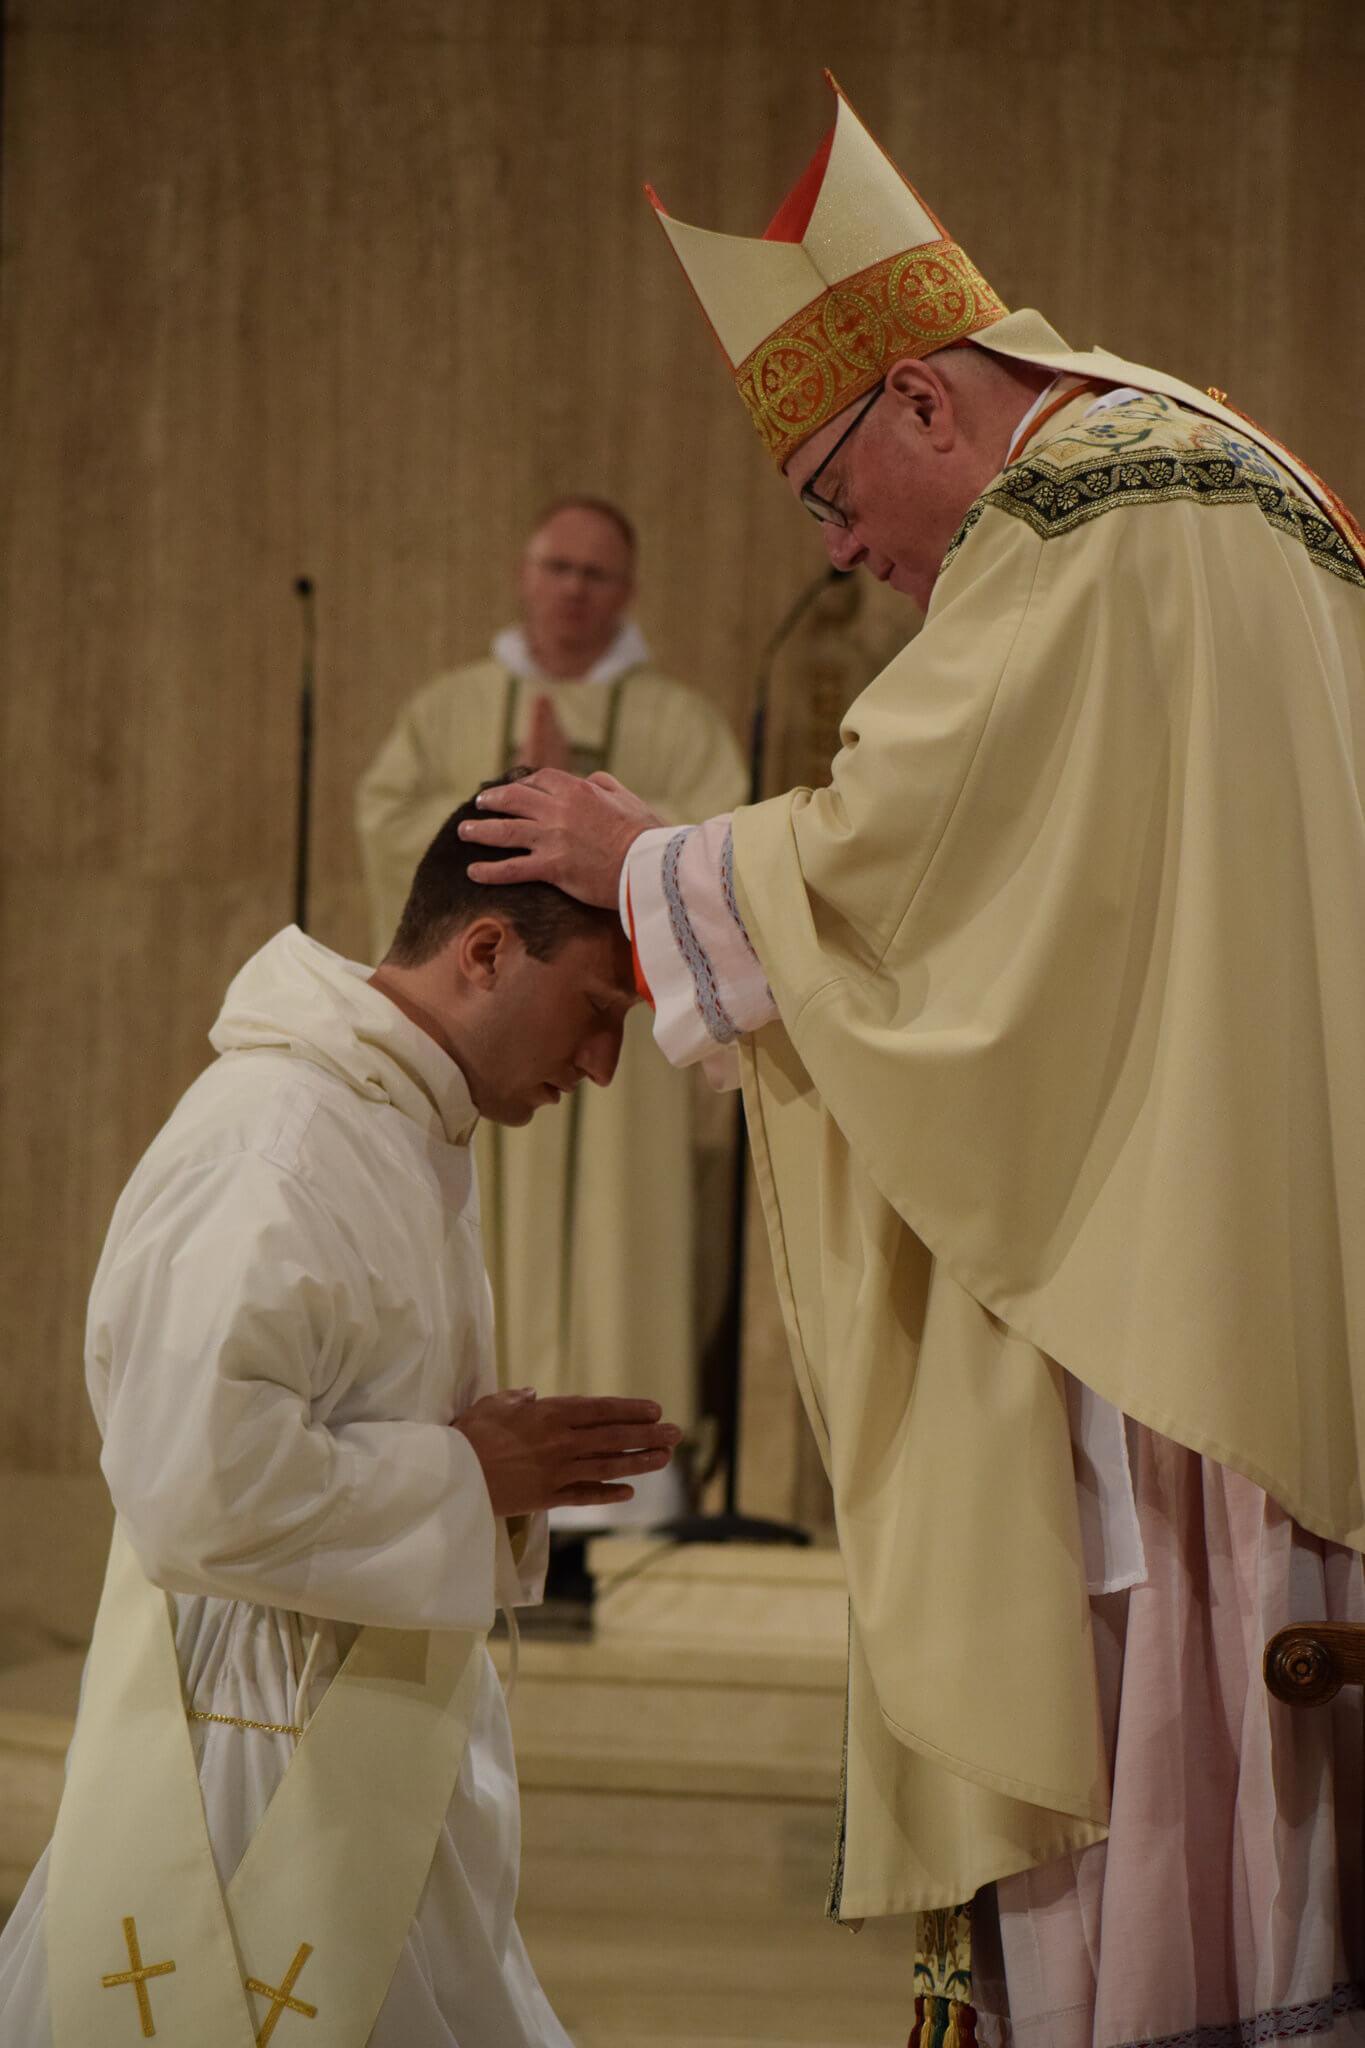 Bild: Kardinal Dolan weiht einen Priester (19. Mai 2018). Provinz Saint Joseph / flickr.com. Lizenz: CC BY-NC-ND 2.0